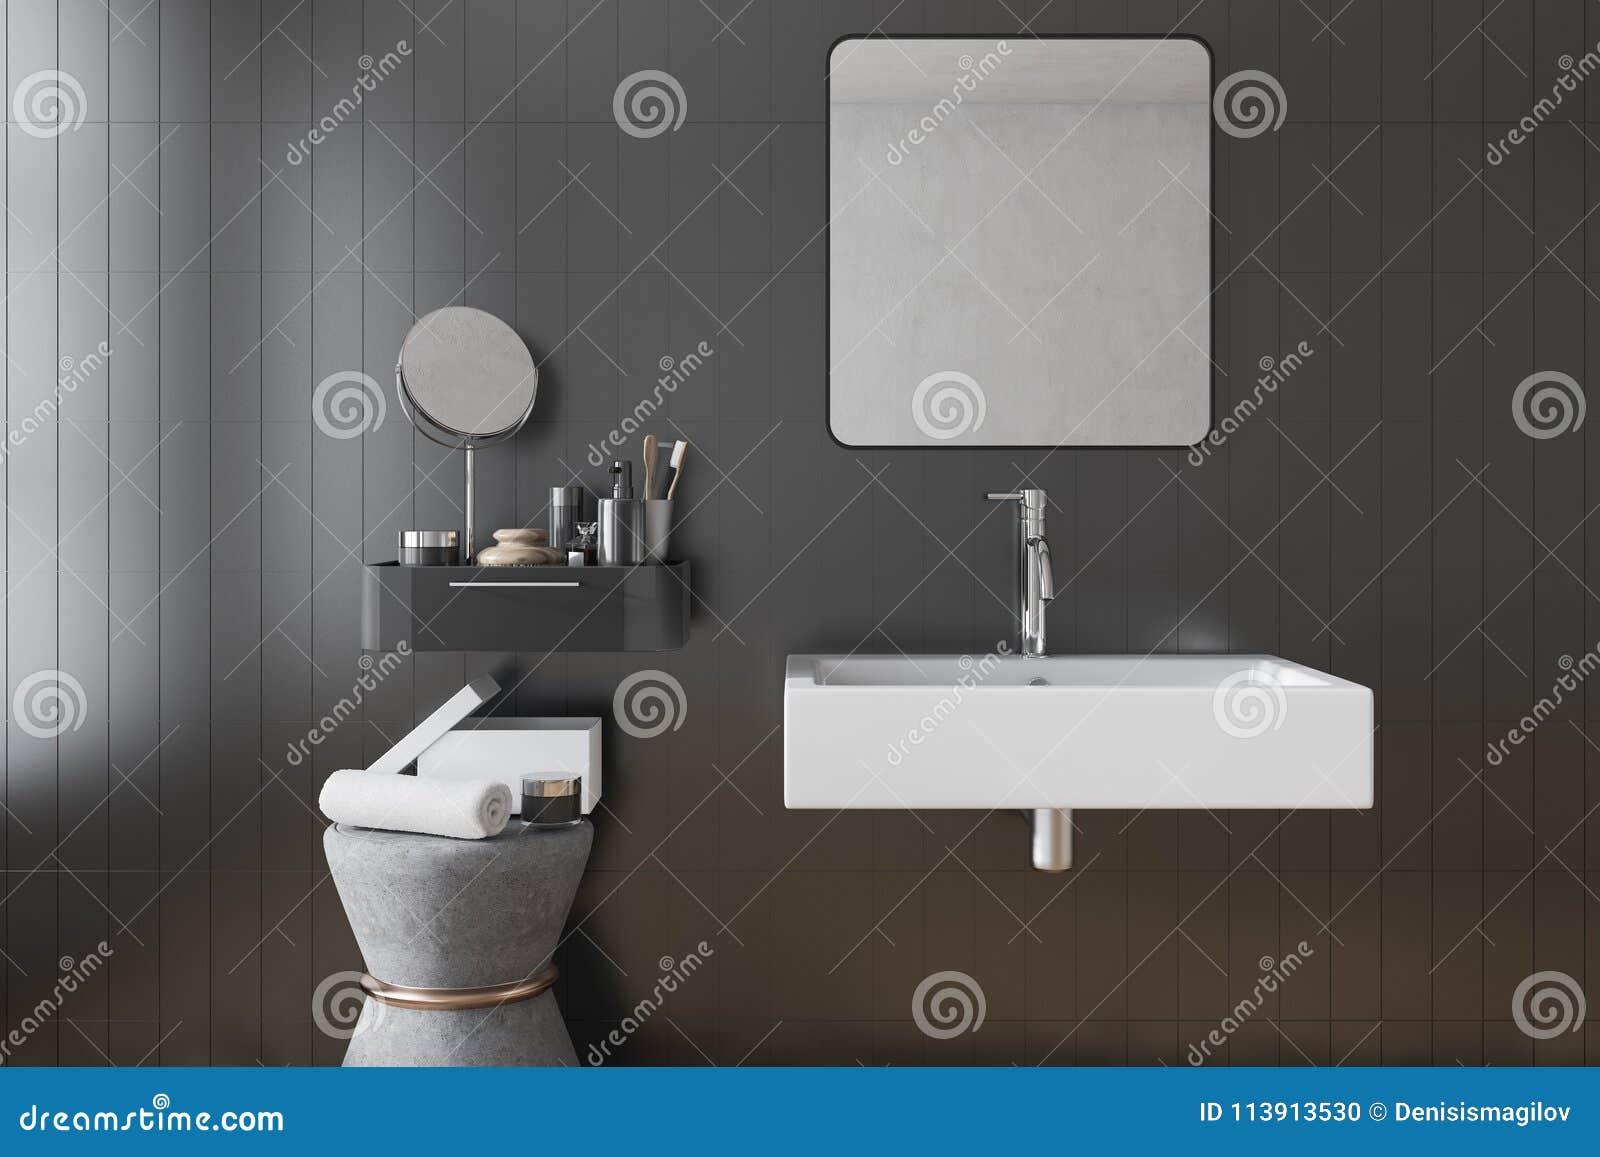 Black Square Bathroom Sink Interior, Tiles Stock Illustration ...